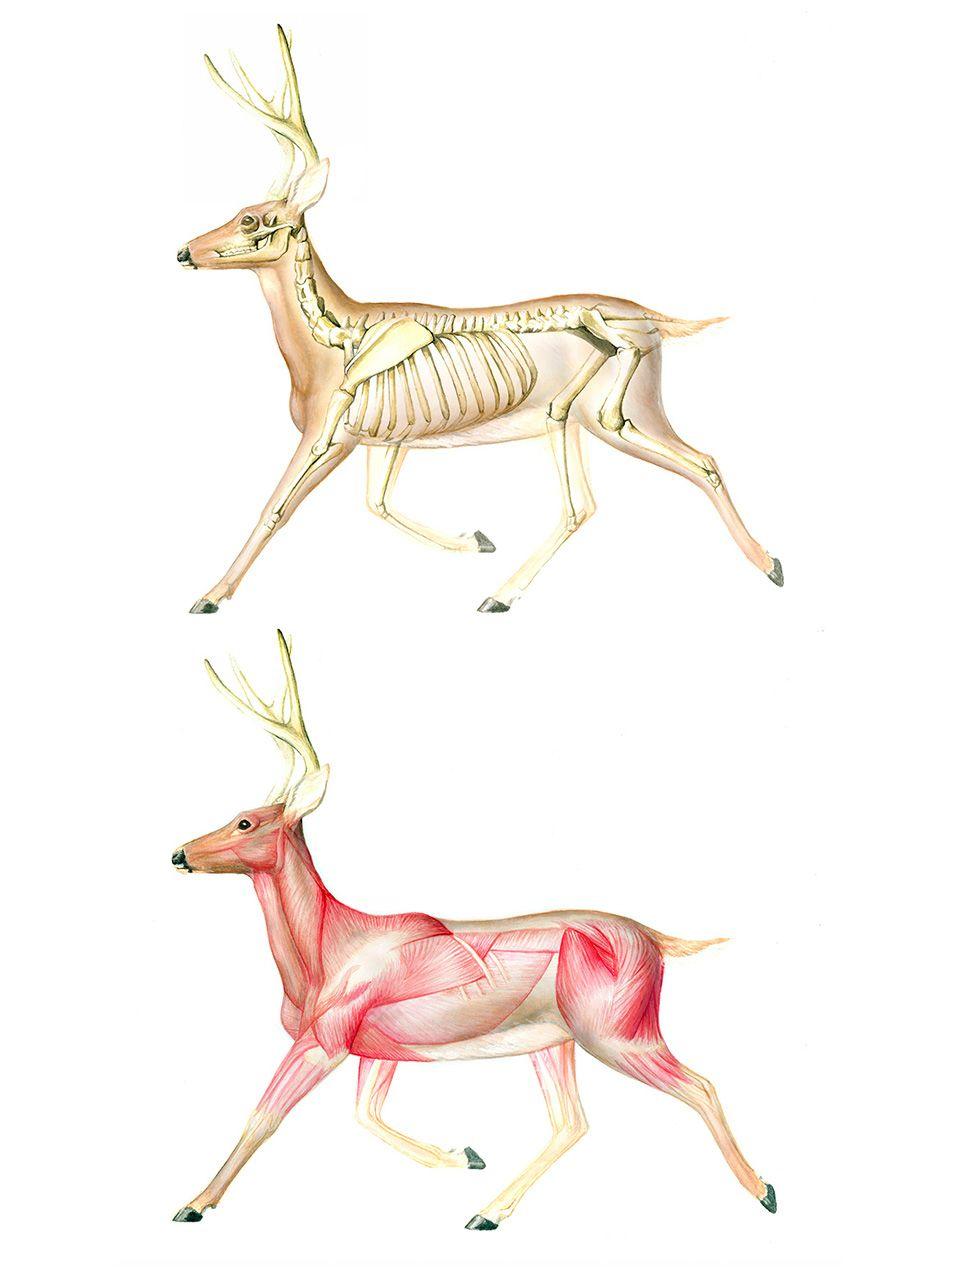 Running deer - skeleton & musculature | Anatomy - animal ...